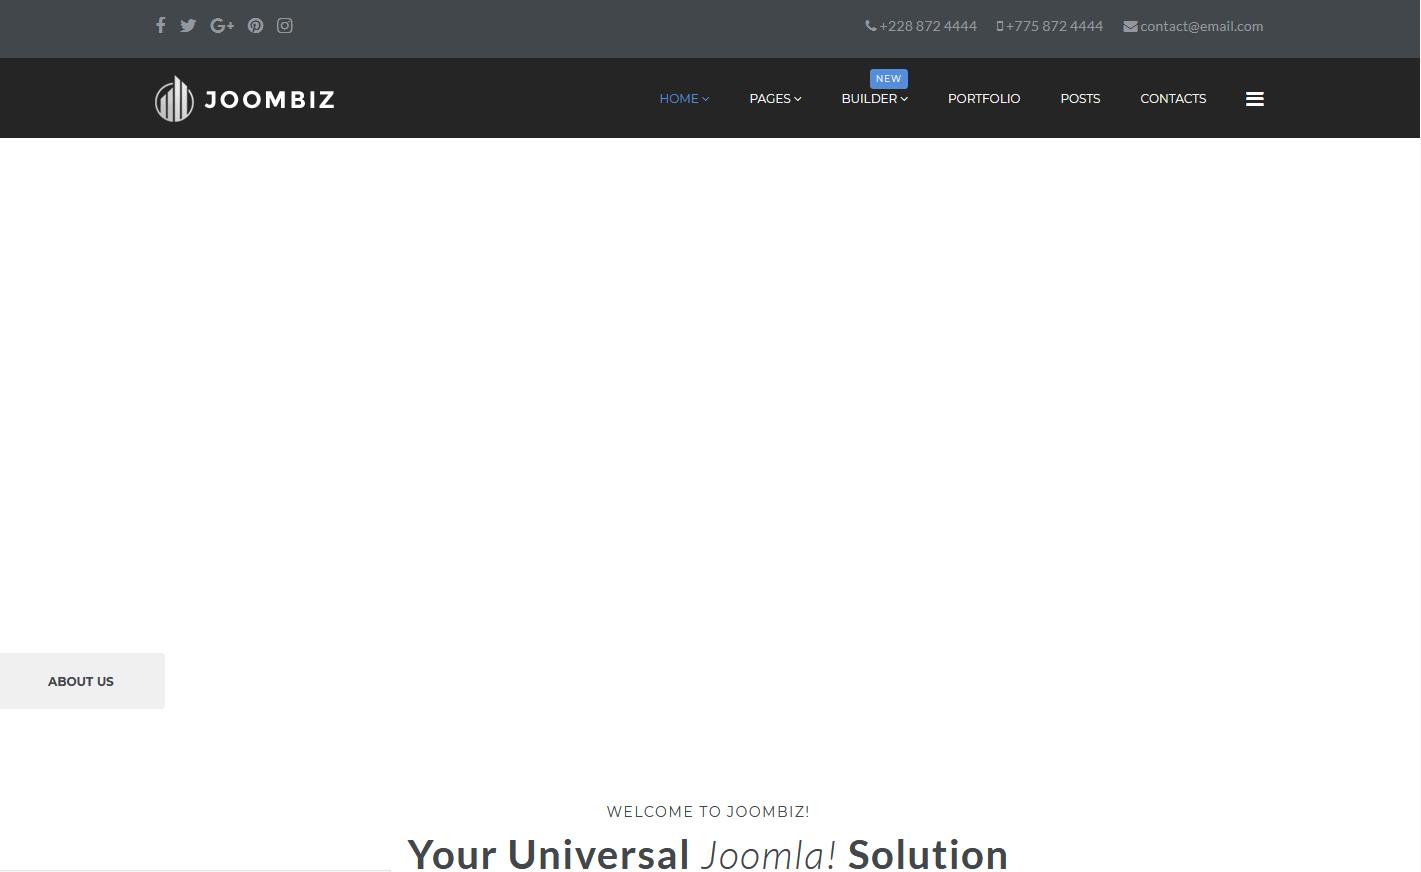 https://www.templatemonster.com/joomla-templates/joombiz-elegant-business-company-joomla-template-69909.html?aff=rahulxarma